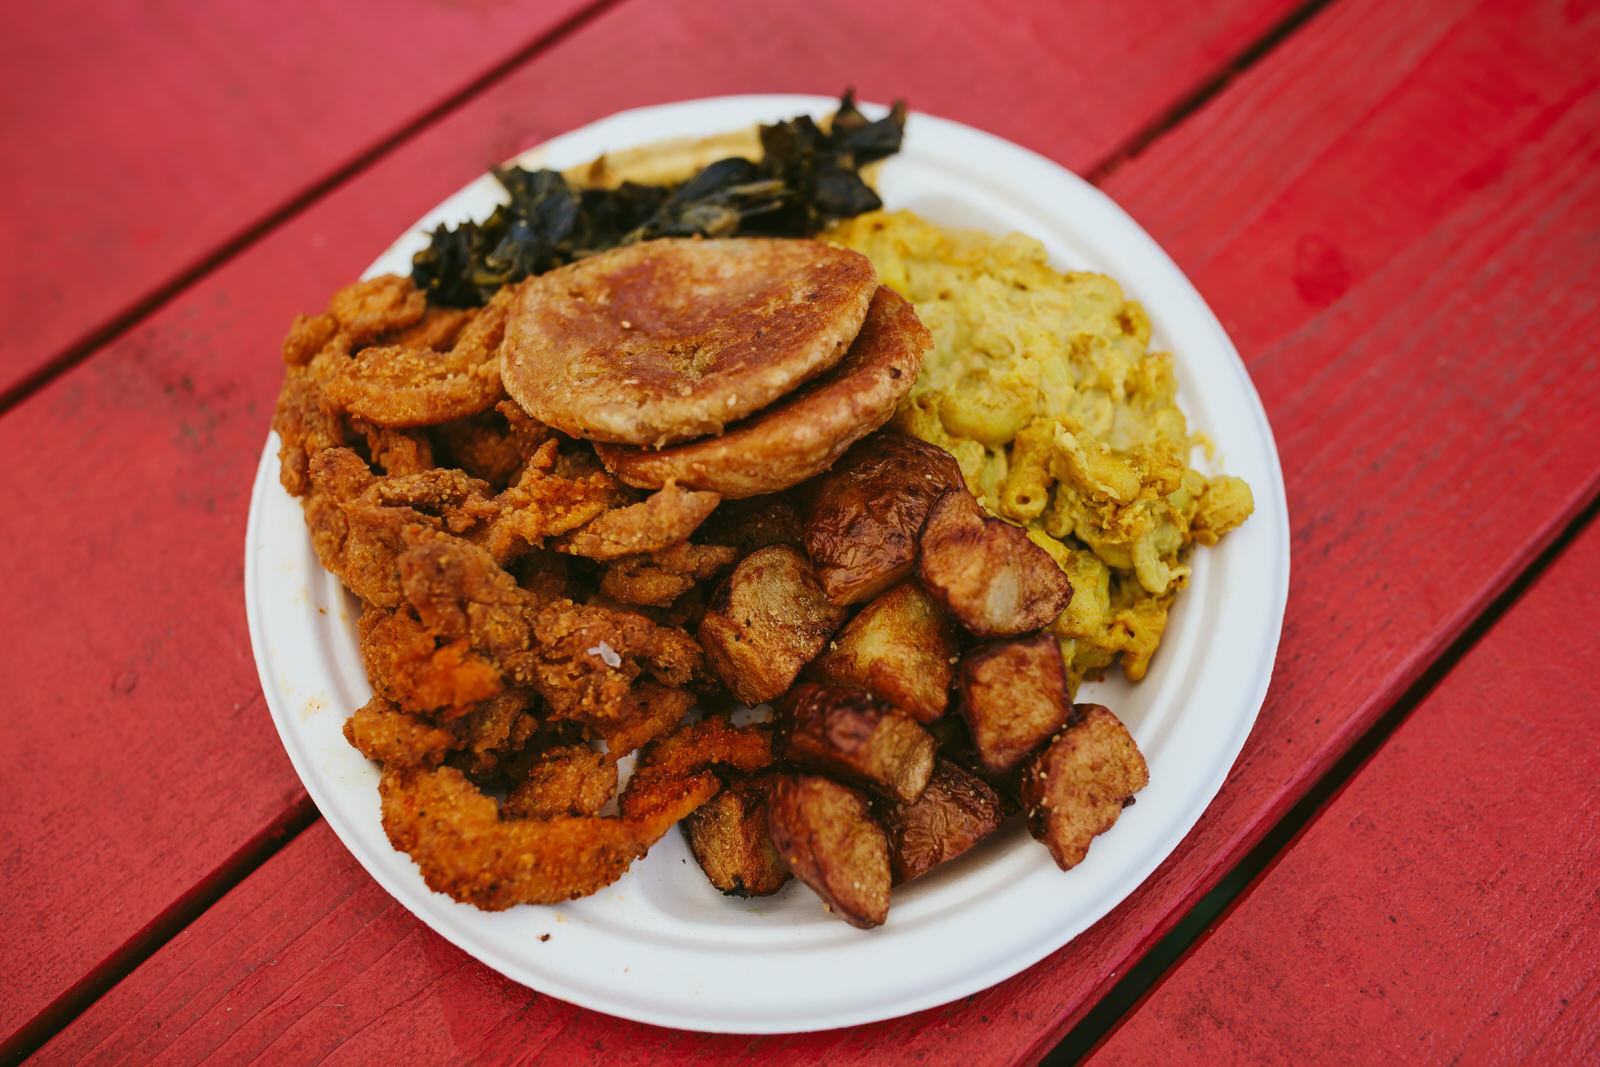 southern-vegan-food-tennessee-nashville-vegancation-tiny-house-photo.jpg